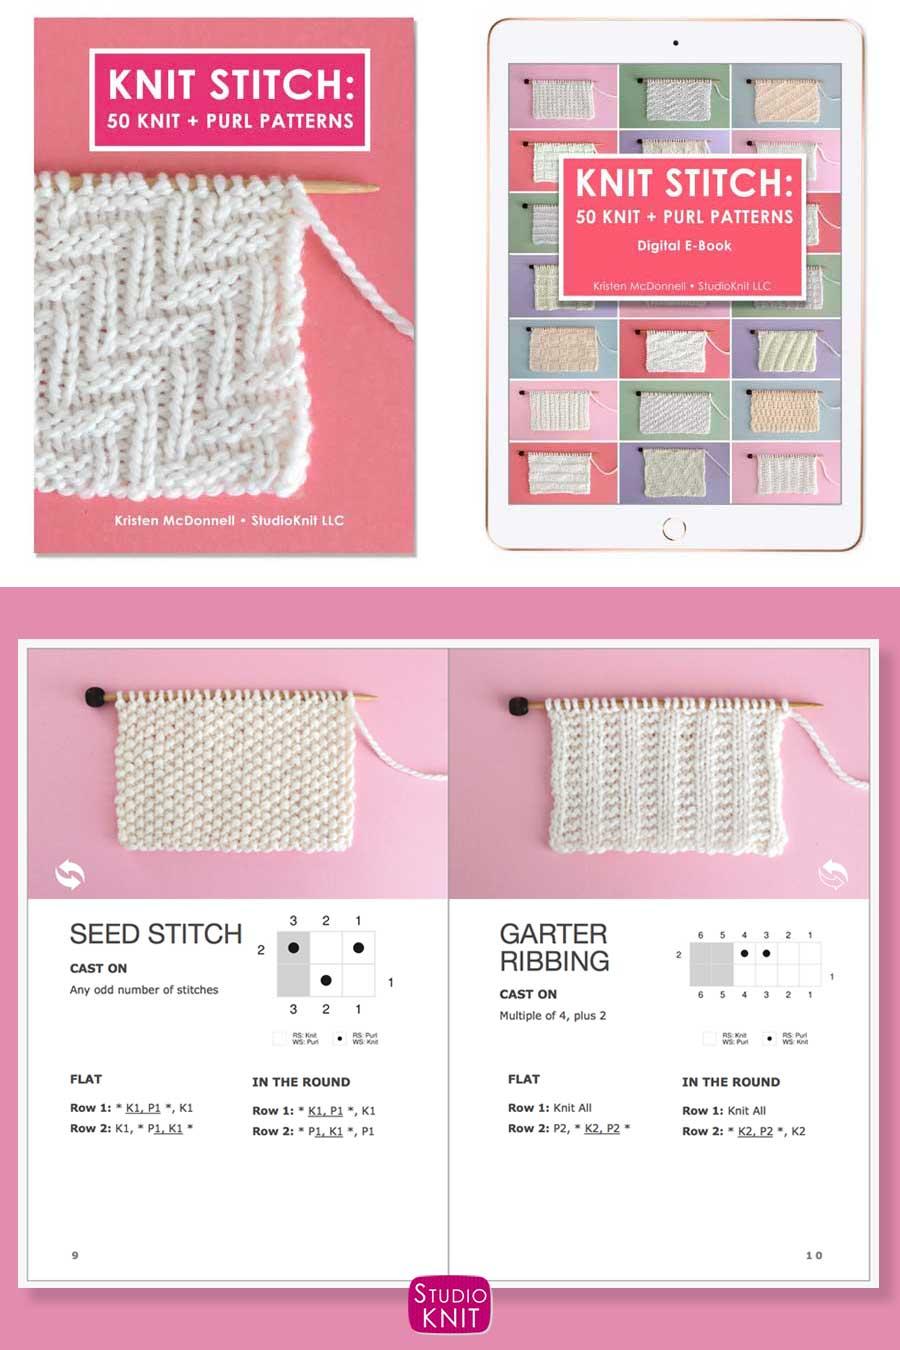 Knit Stitch Pattern Book with Seed and Garter Ribbing Stitch Patterns